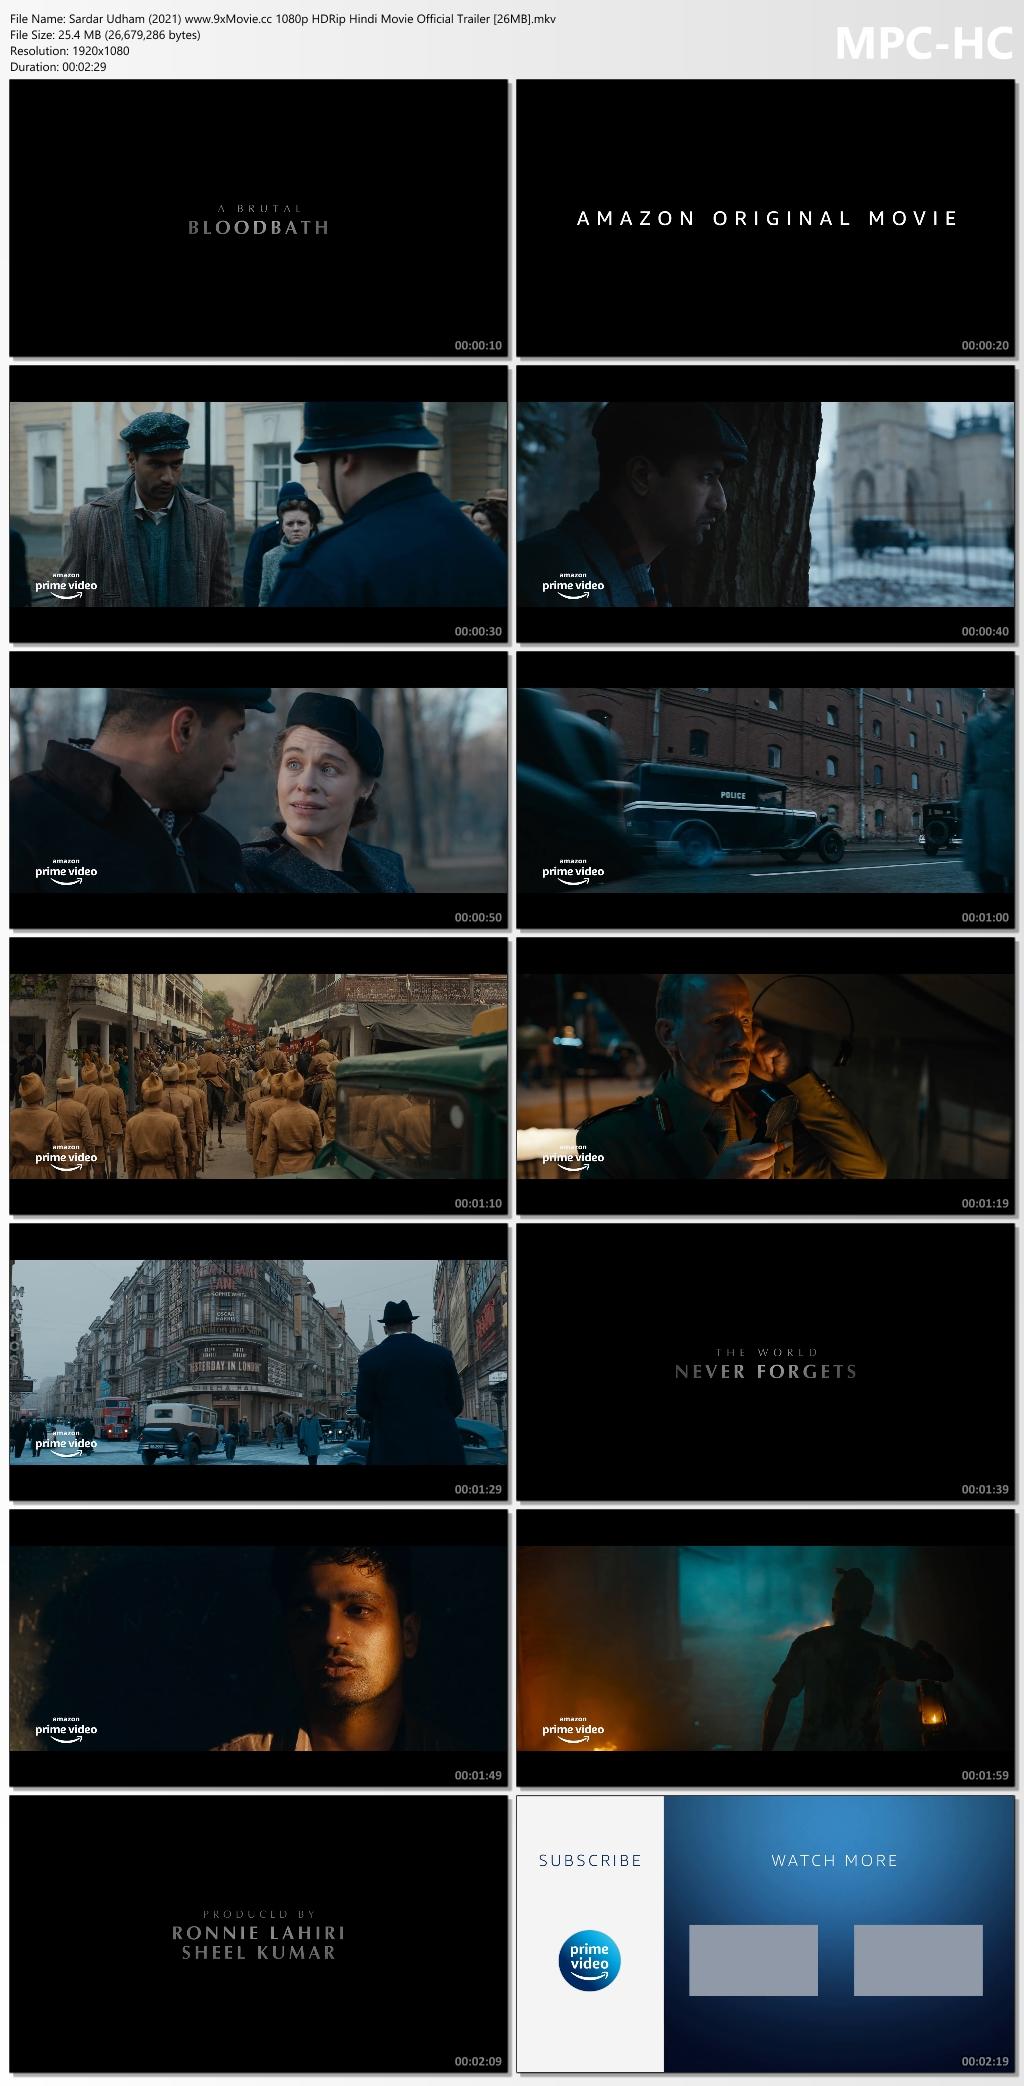 Sardar-Udham-2021-www-9x-Movie-cc-1080p-HDRip-Hindi-Movie-Official-Trailer-26-MB-mkv